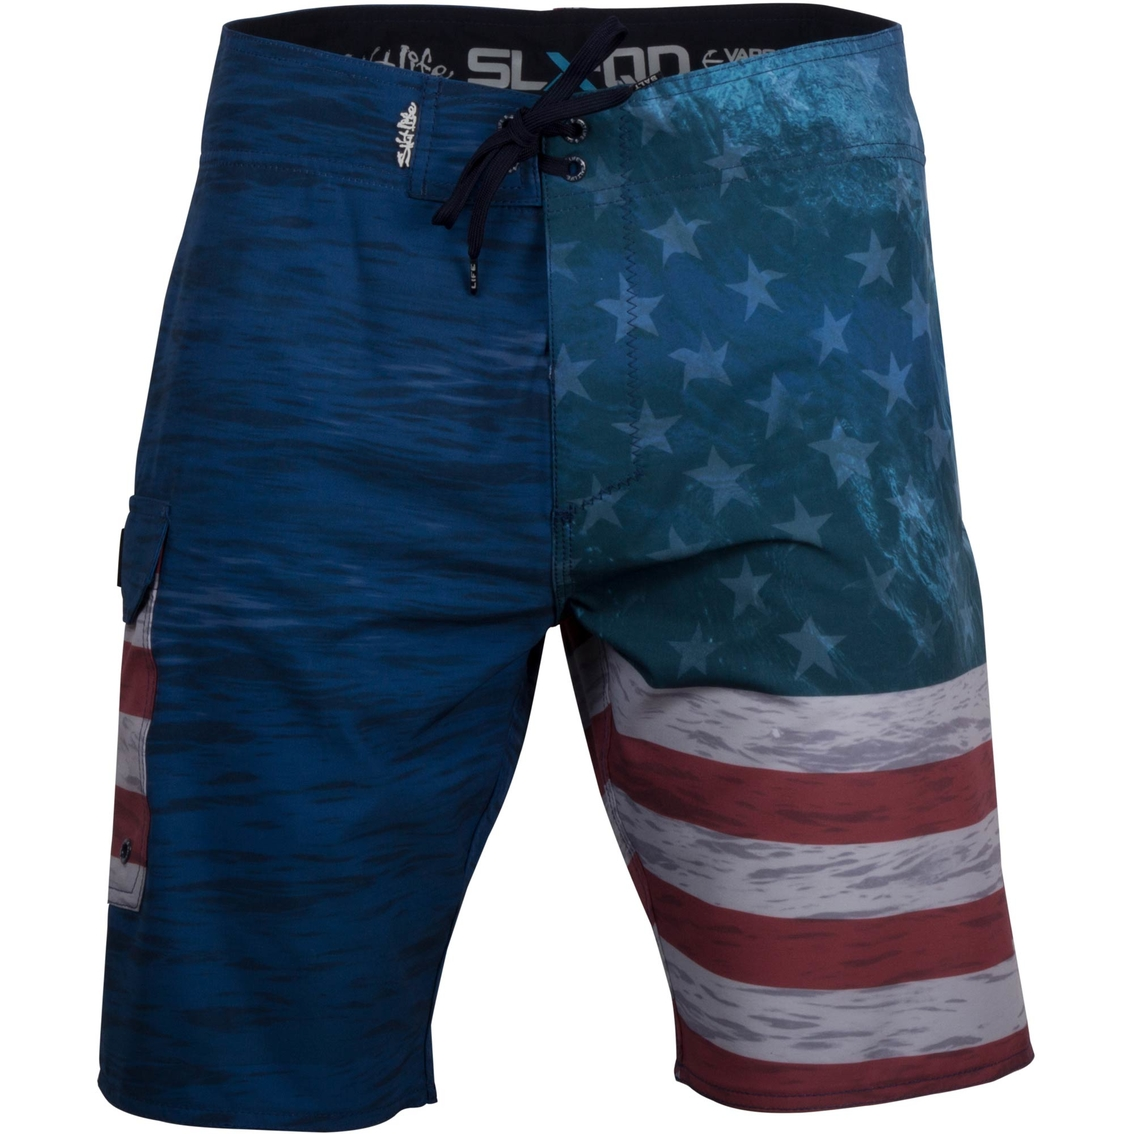 dffb509ab5 Salt Life Ameriseas Performance Aqua Trunk Board Shorts | Swimwear ...